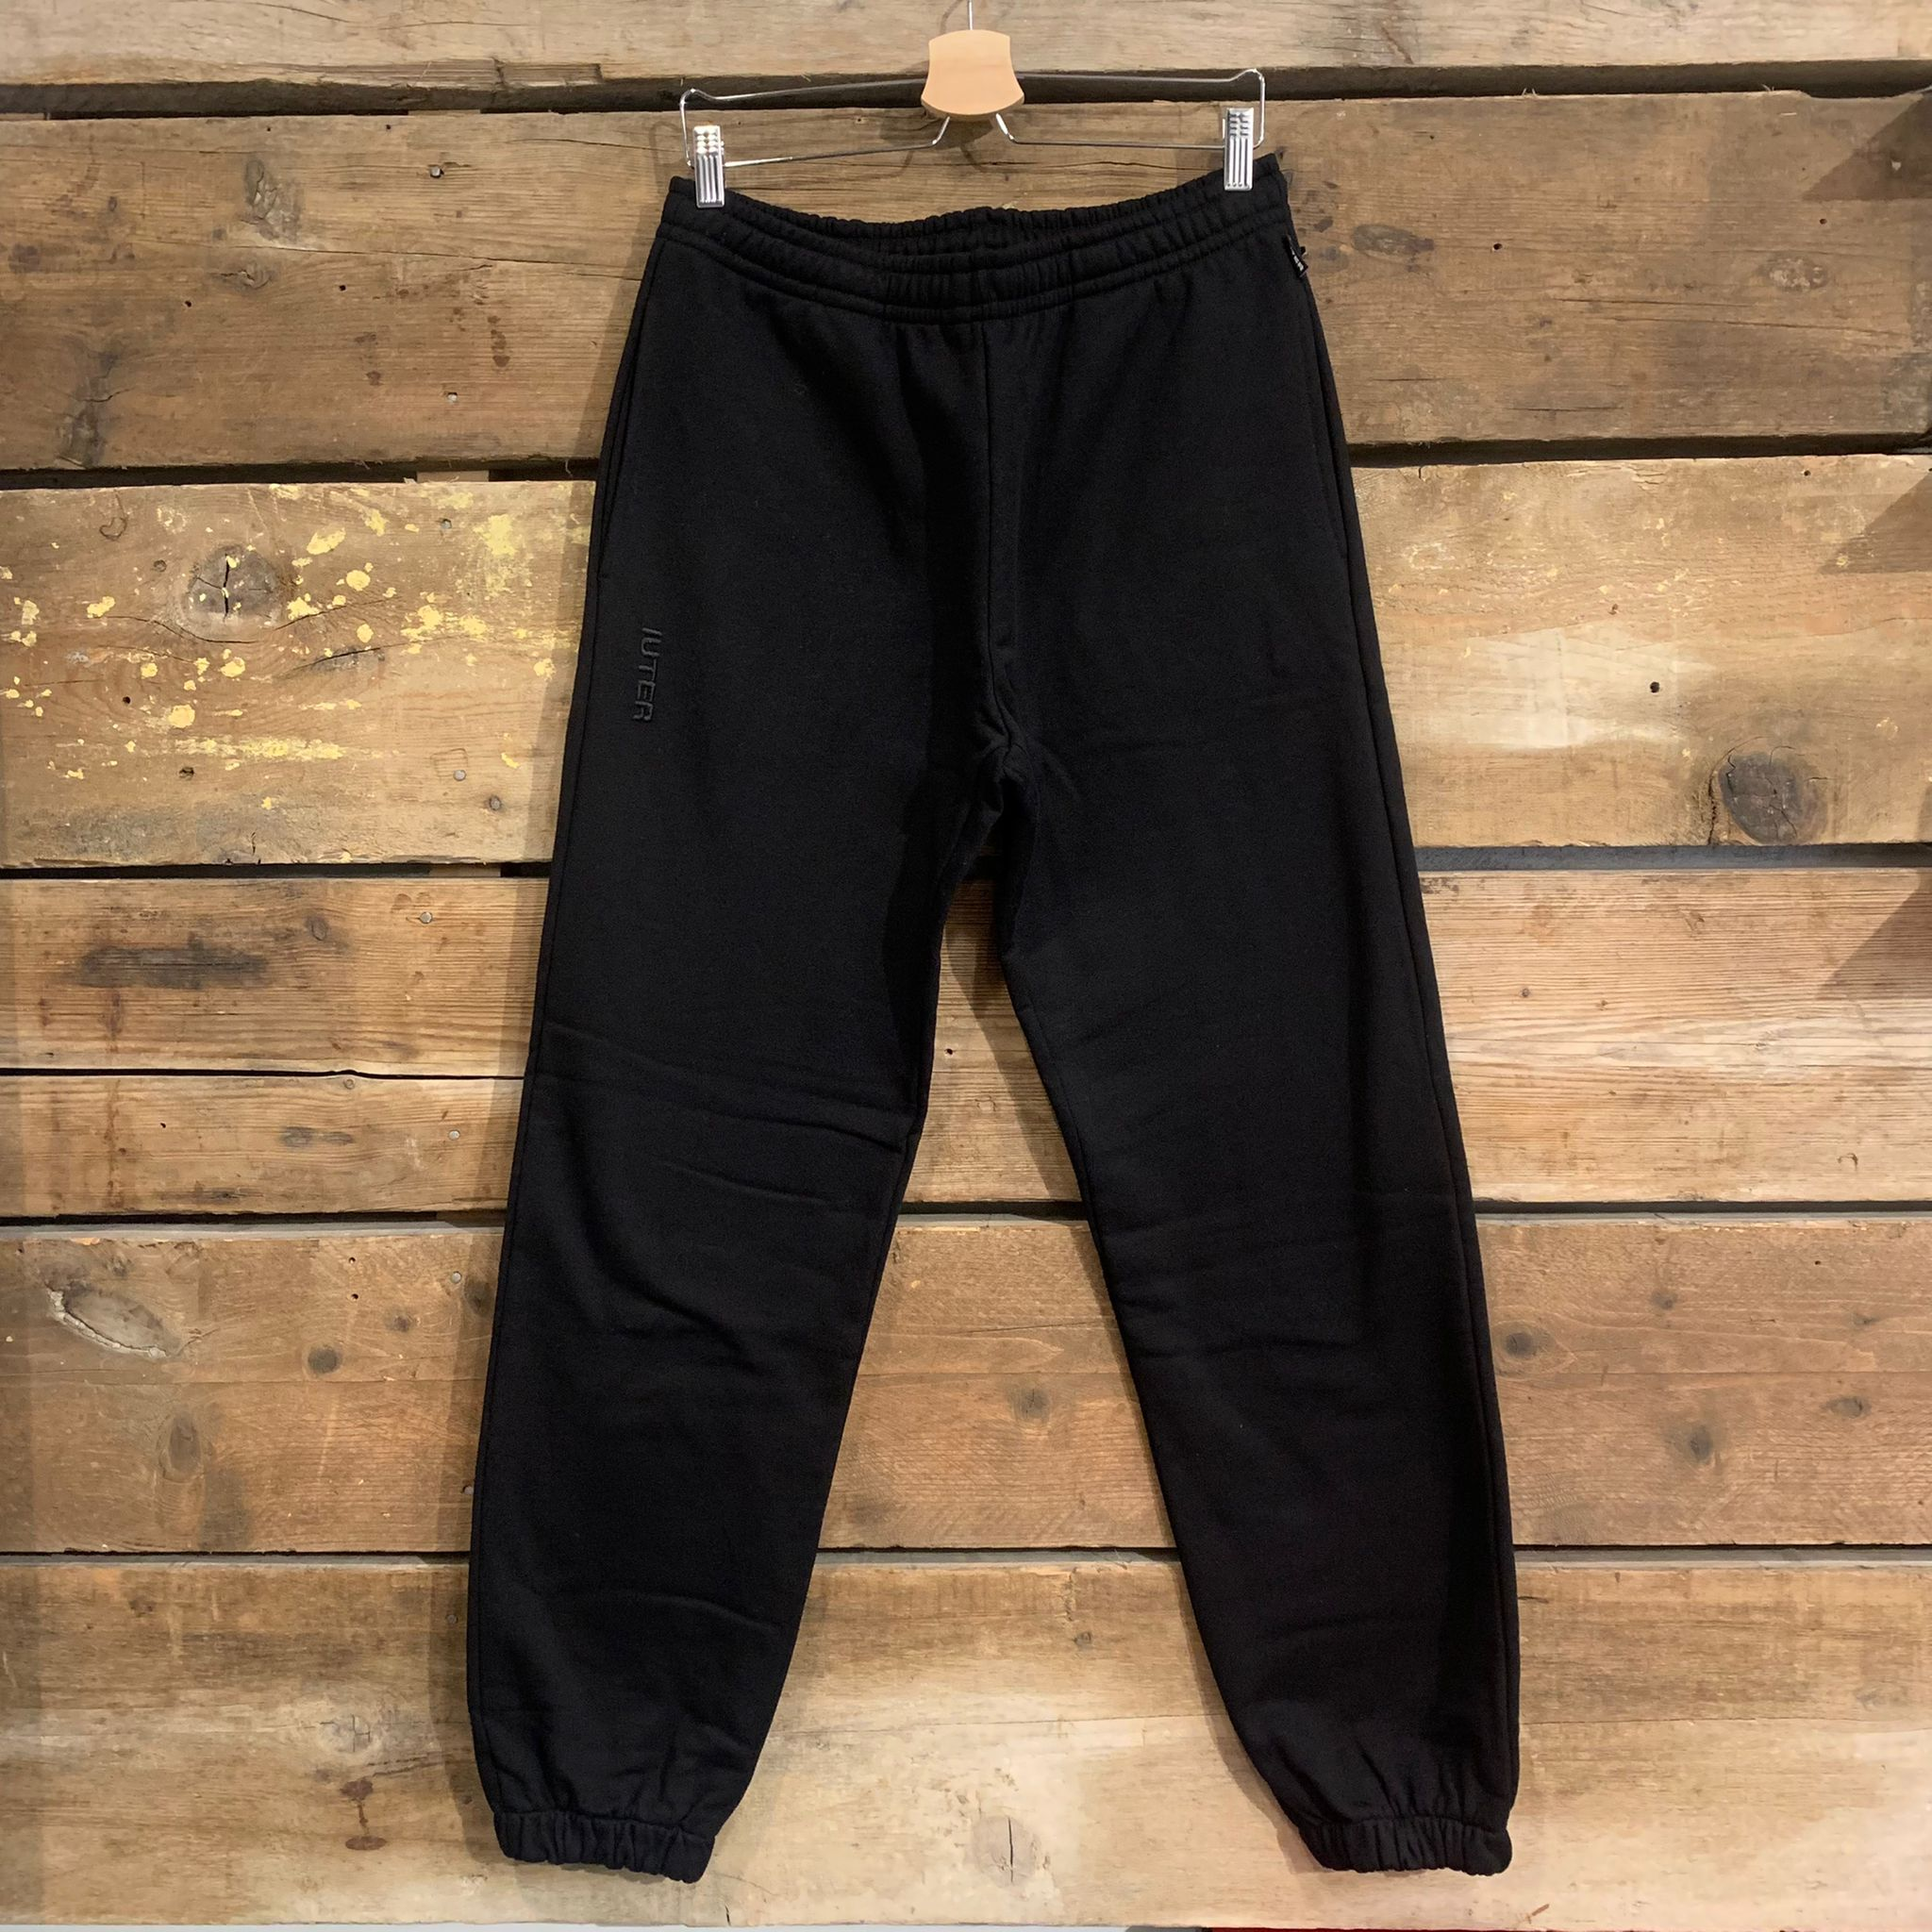 Pantalone Iuter Jogger Basic Sweatpant Nero